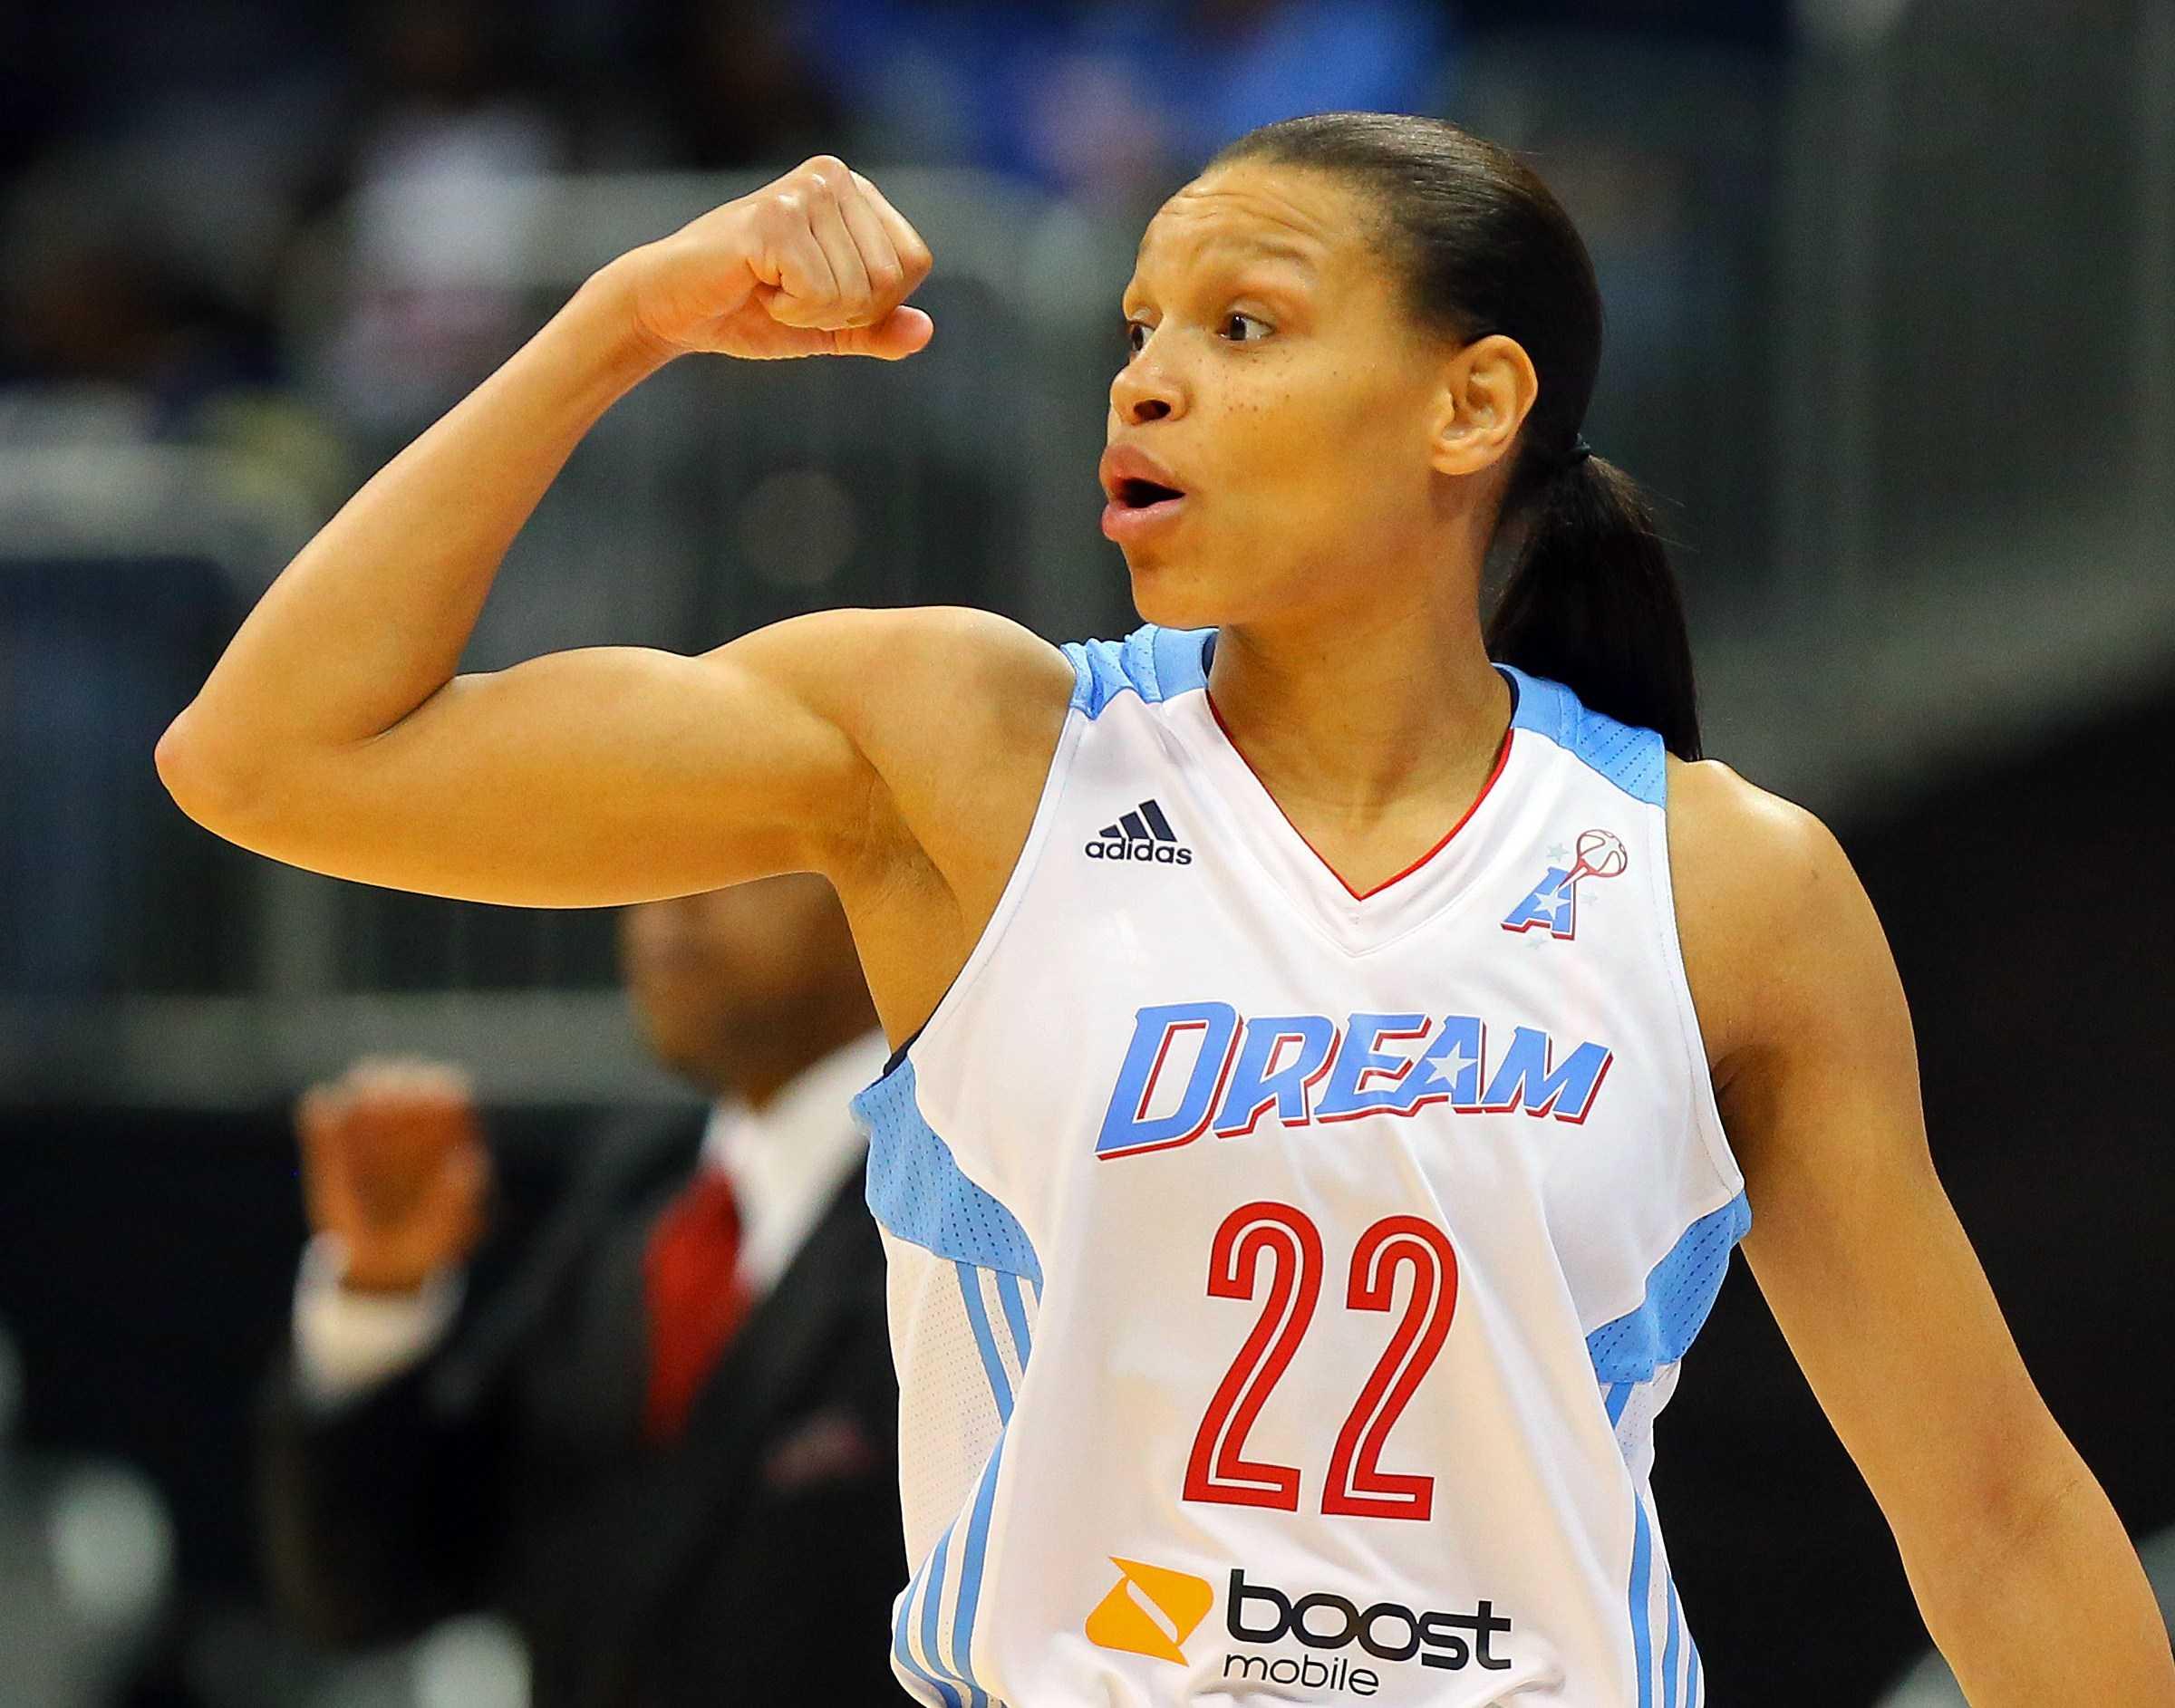 Top 10 Highlight Plays of the 2010 WNBA Season